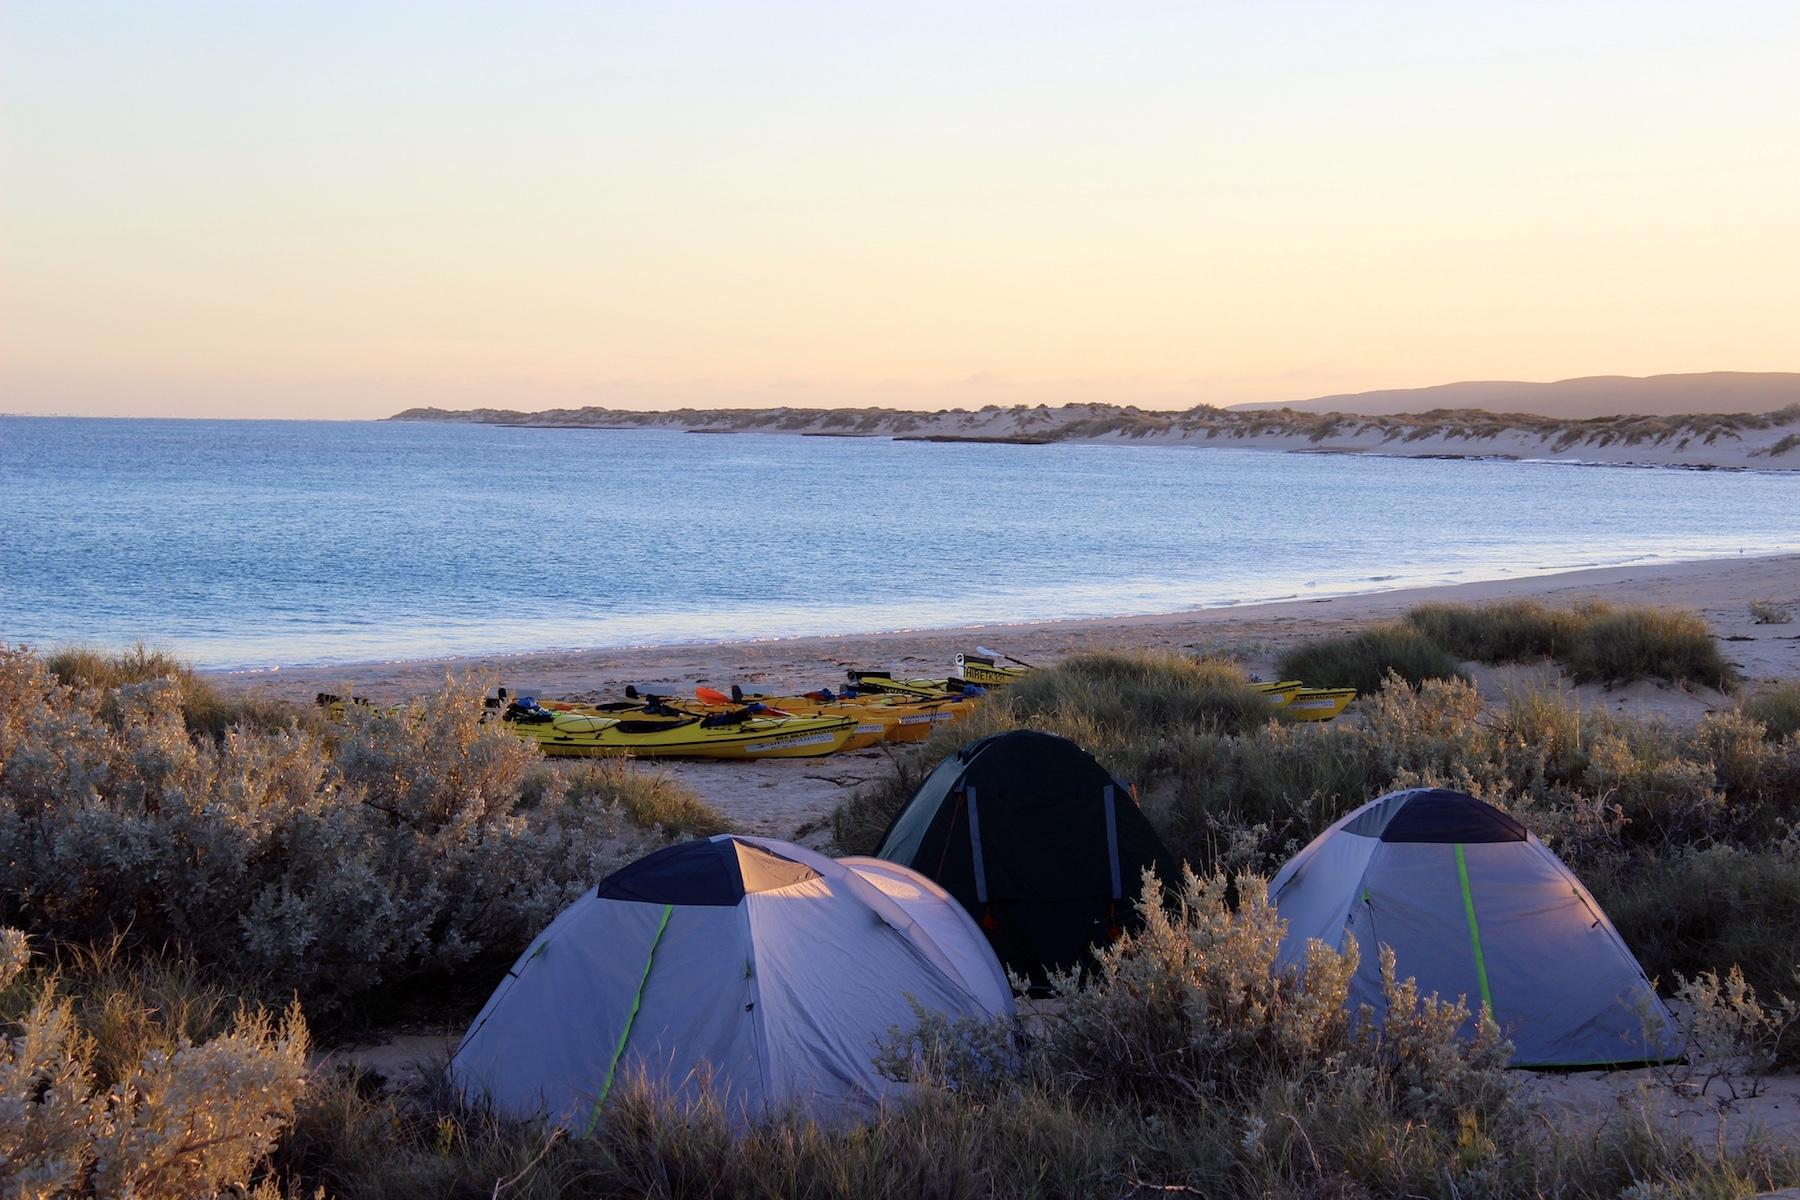 3 day Reef and Beach, 4 day Reef and Beach and Whale Shark Adventure Package, camp, kayak, snorkel, eco tour, Ningaloo Reef, Cape Range National Park, Exmouth Adventure Co, Western Australia